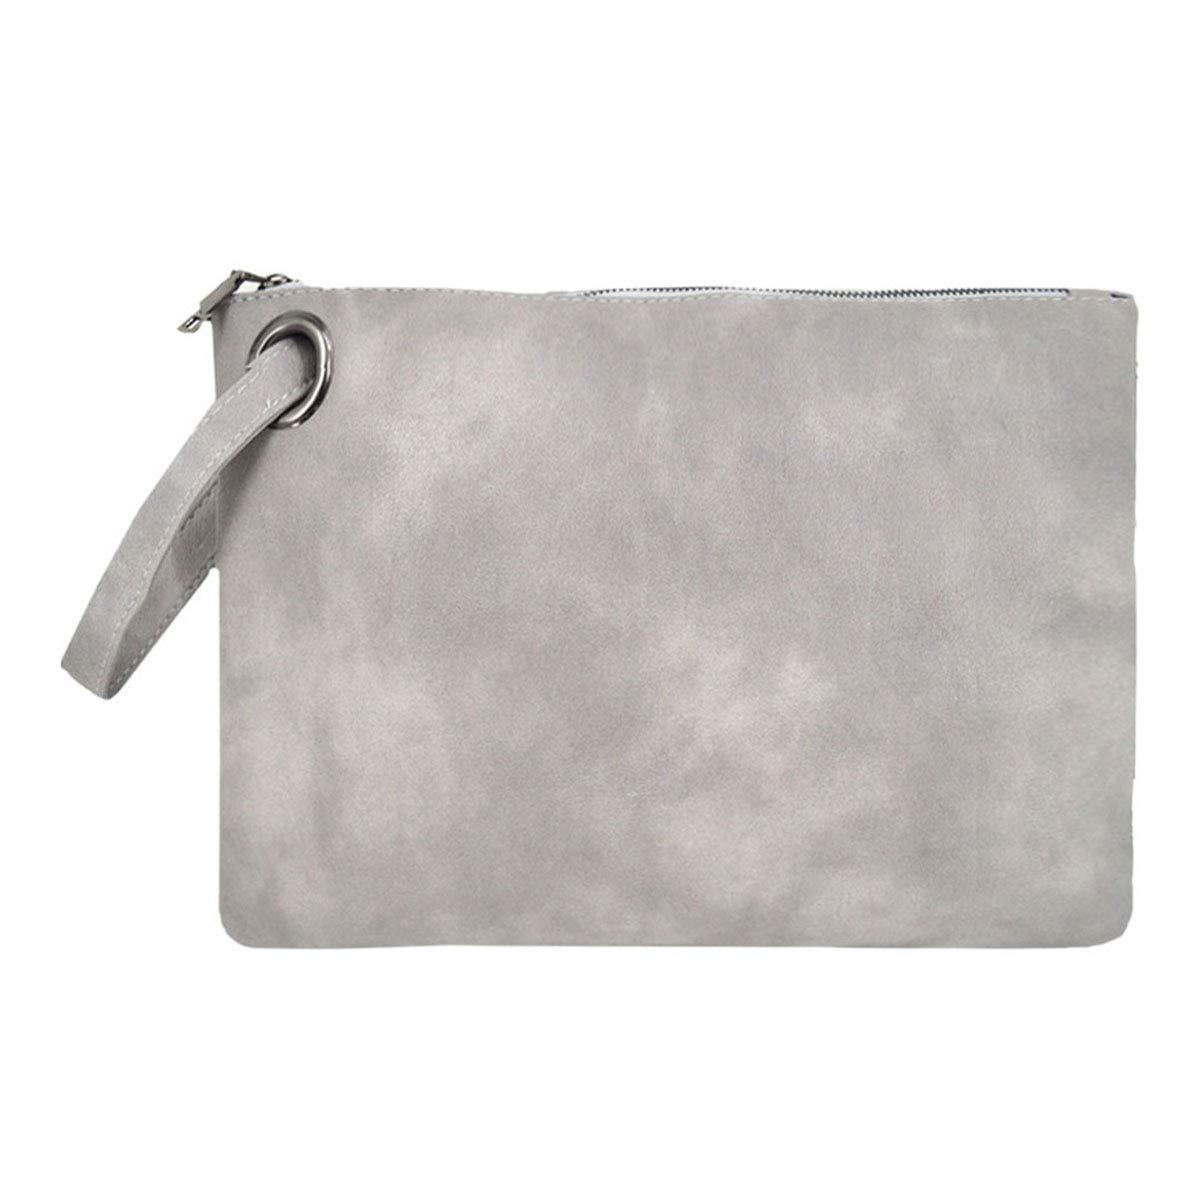 Goodbag Boutique Women Oversized Clutch Purse Bag PU Leather Large Capacity Clutch Handbag Lady Wristlet Purse Evening Bag